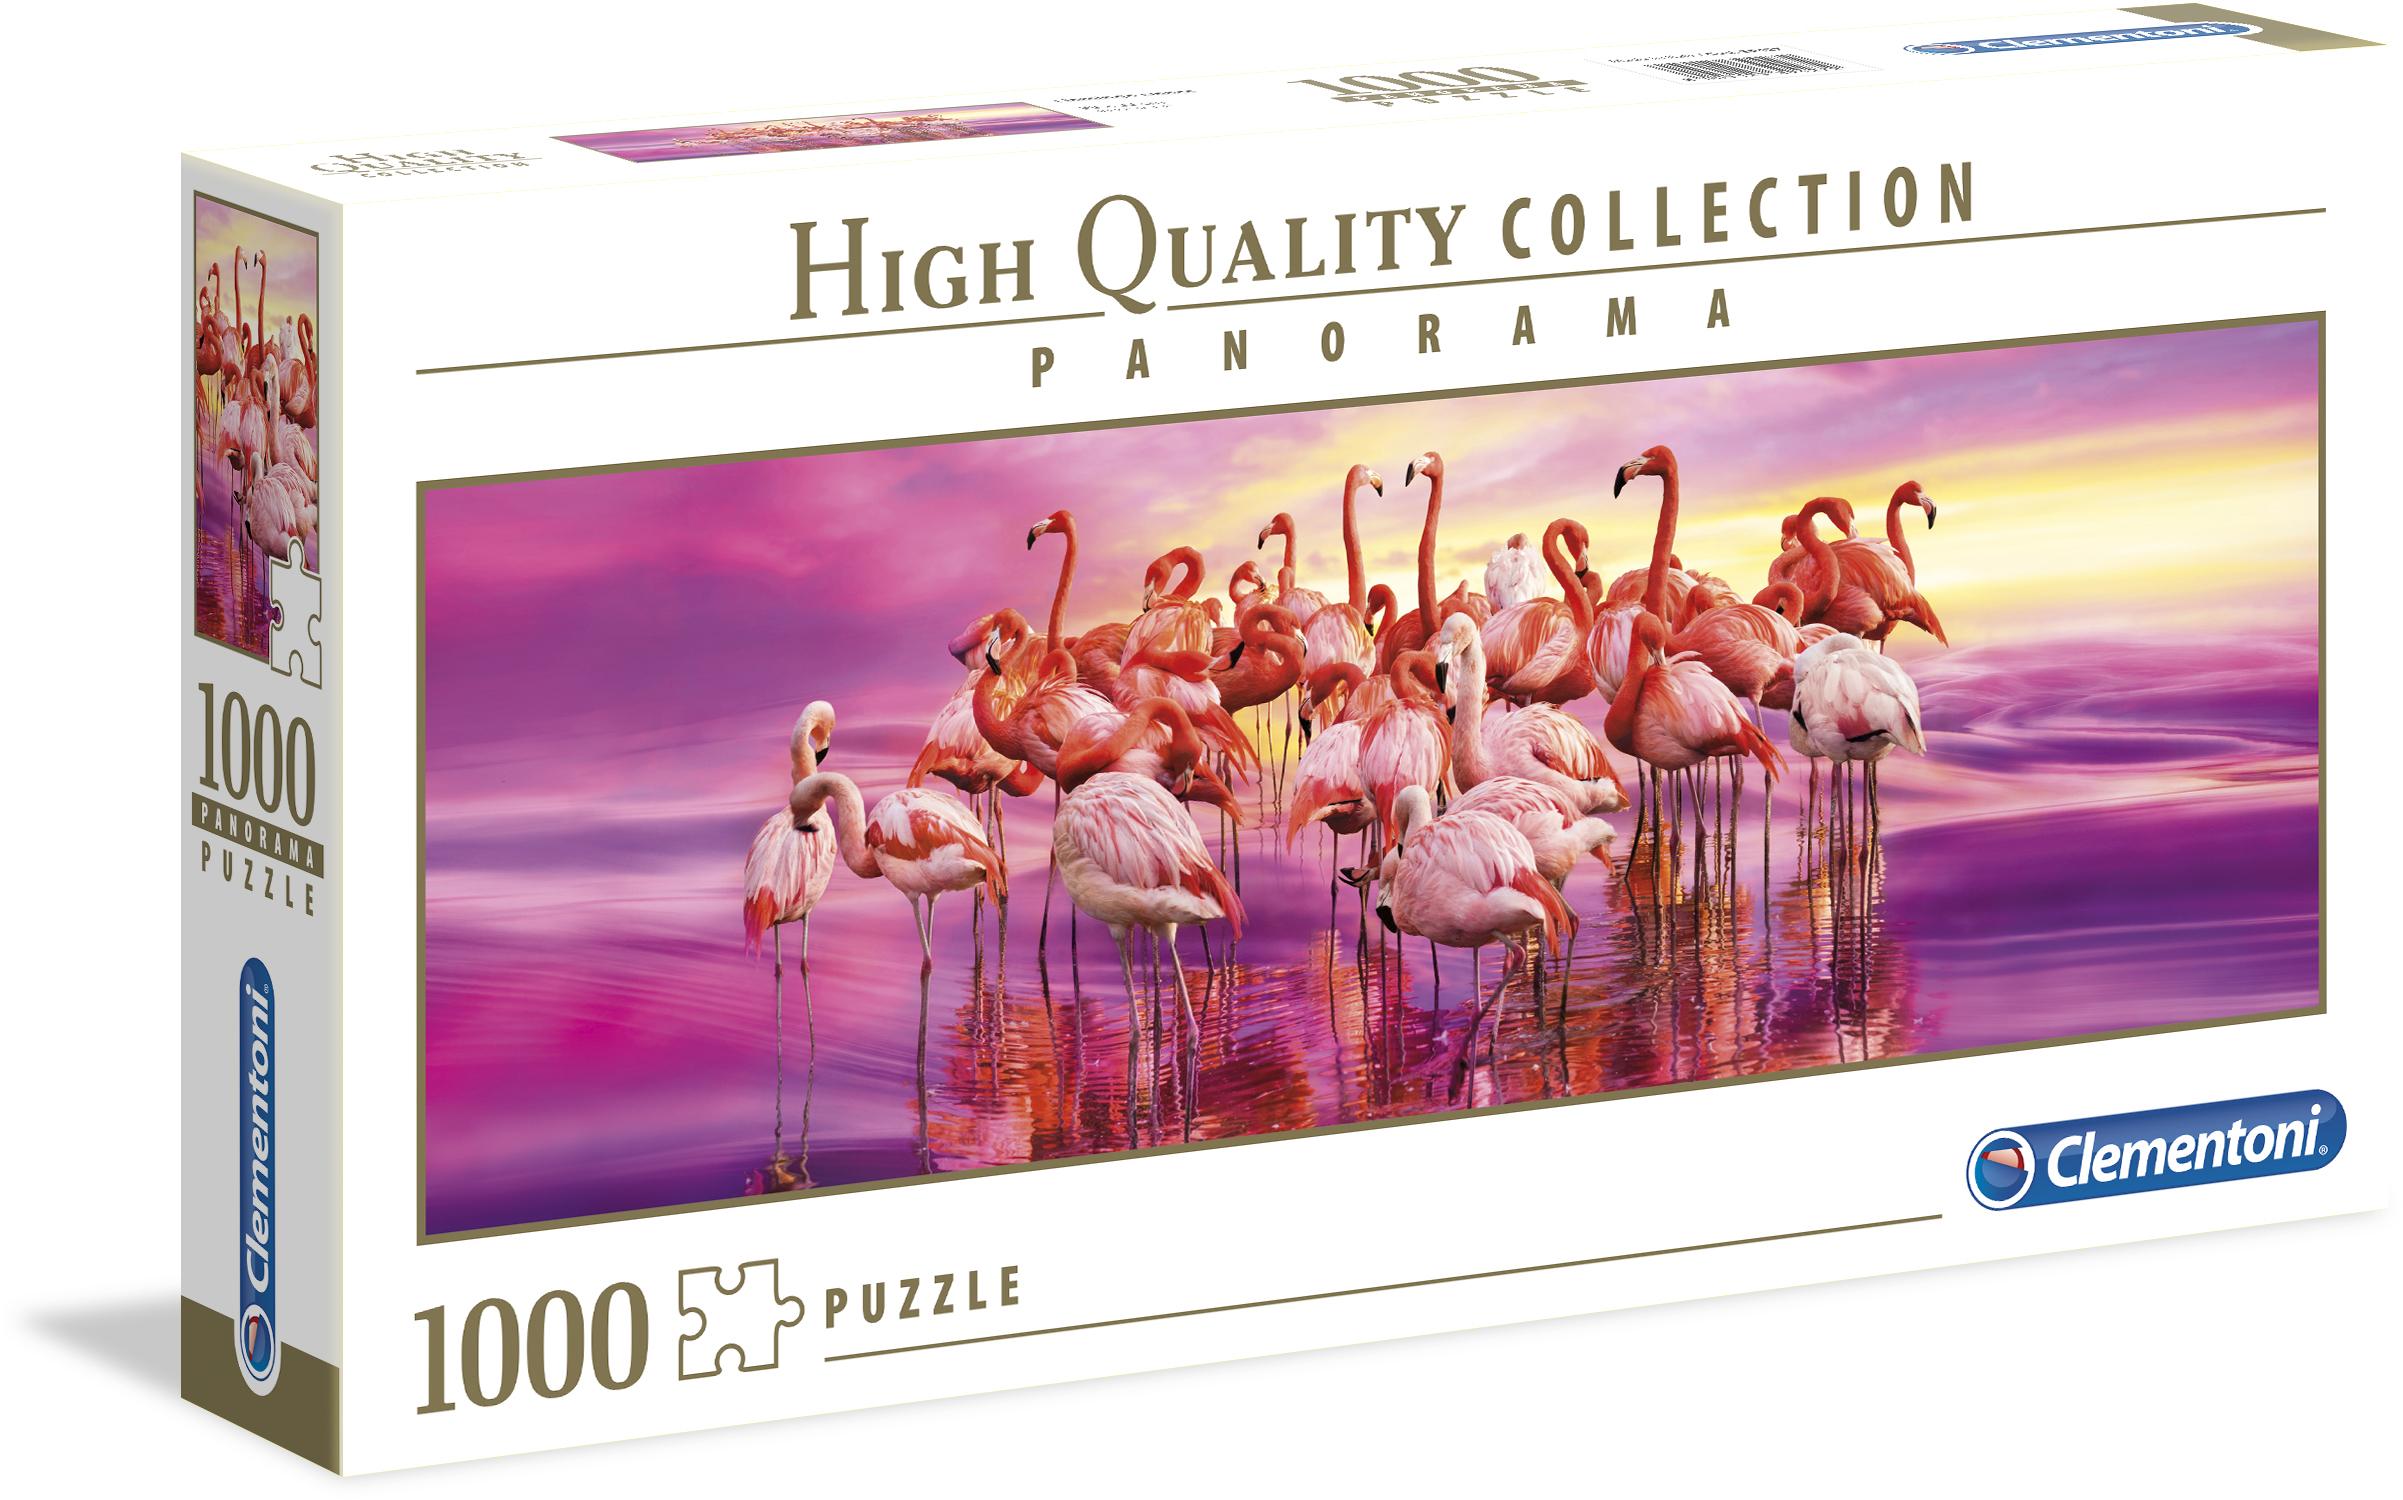 Clementoni Puzzle Tanz der Flamingos, Made in Europe rosa Kinder Ab 9-11 Jahren Altersempfehlung Puzzles